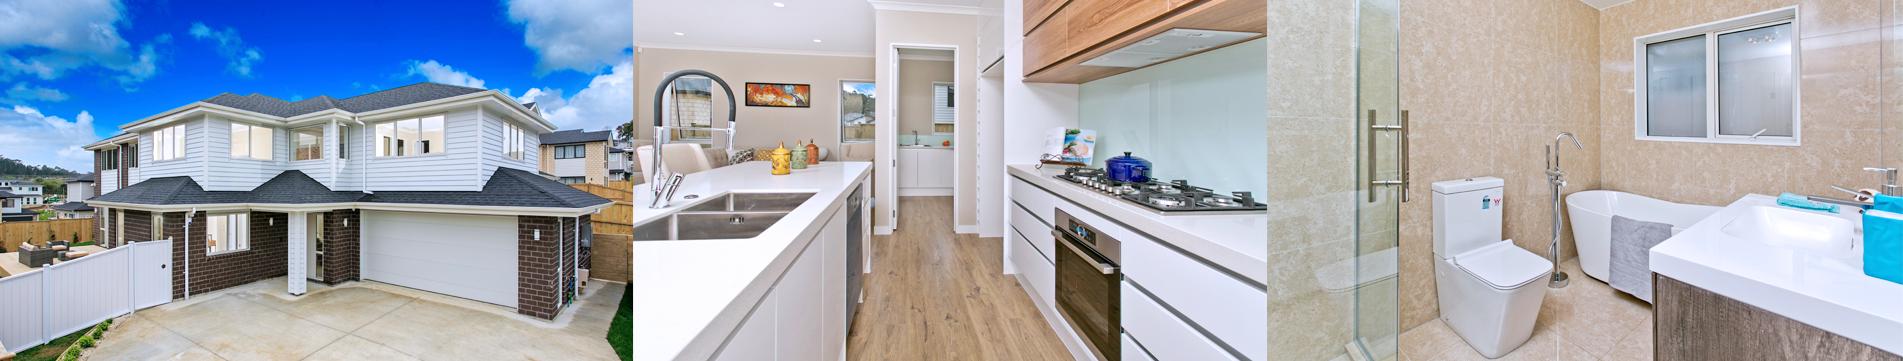 3-pics-4, Kitchen Renovation, Bathroom Renovation, House Renovation Auckland